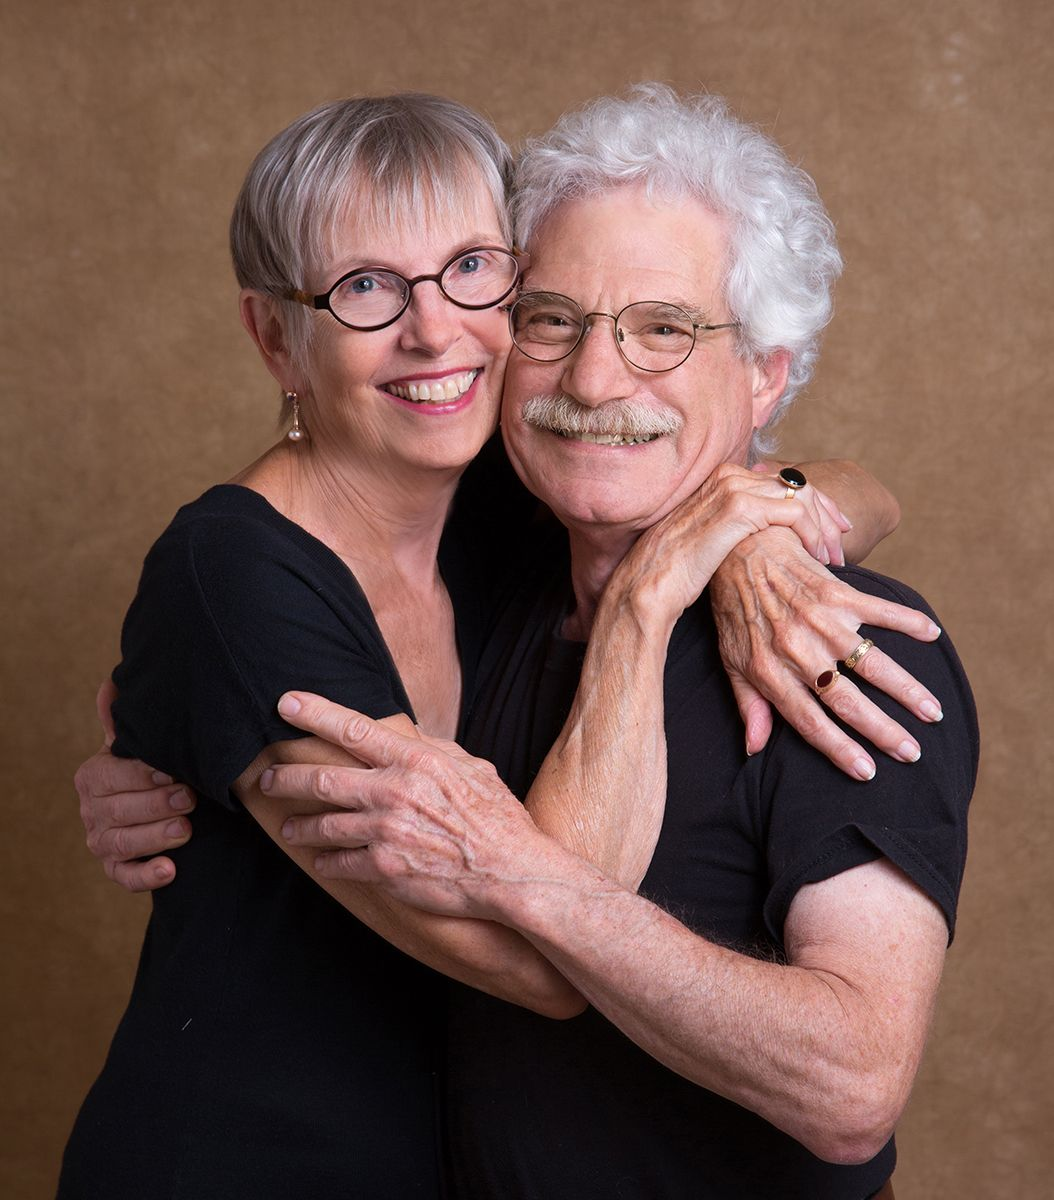 Linda and Steve - Anniversary